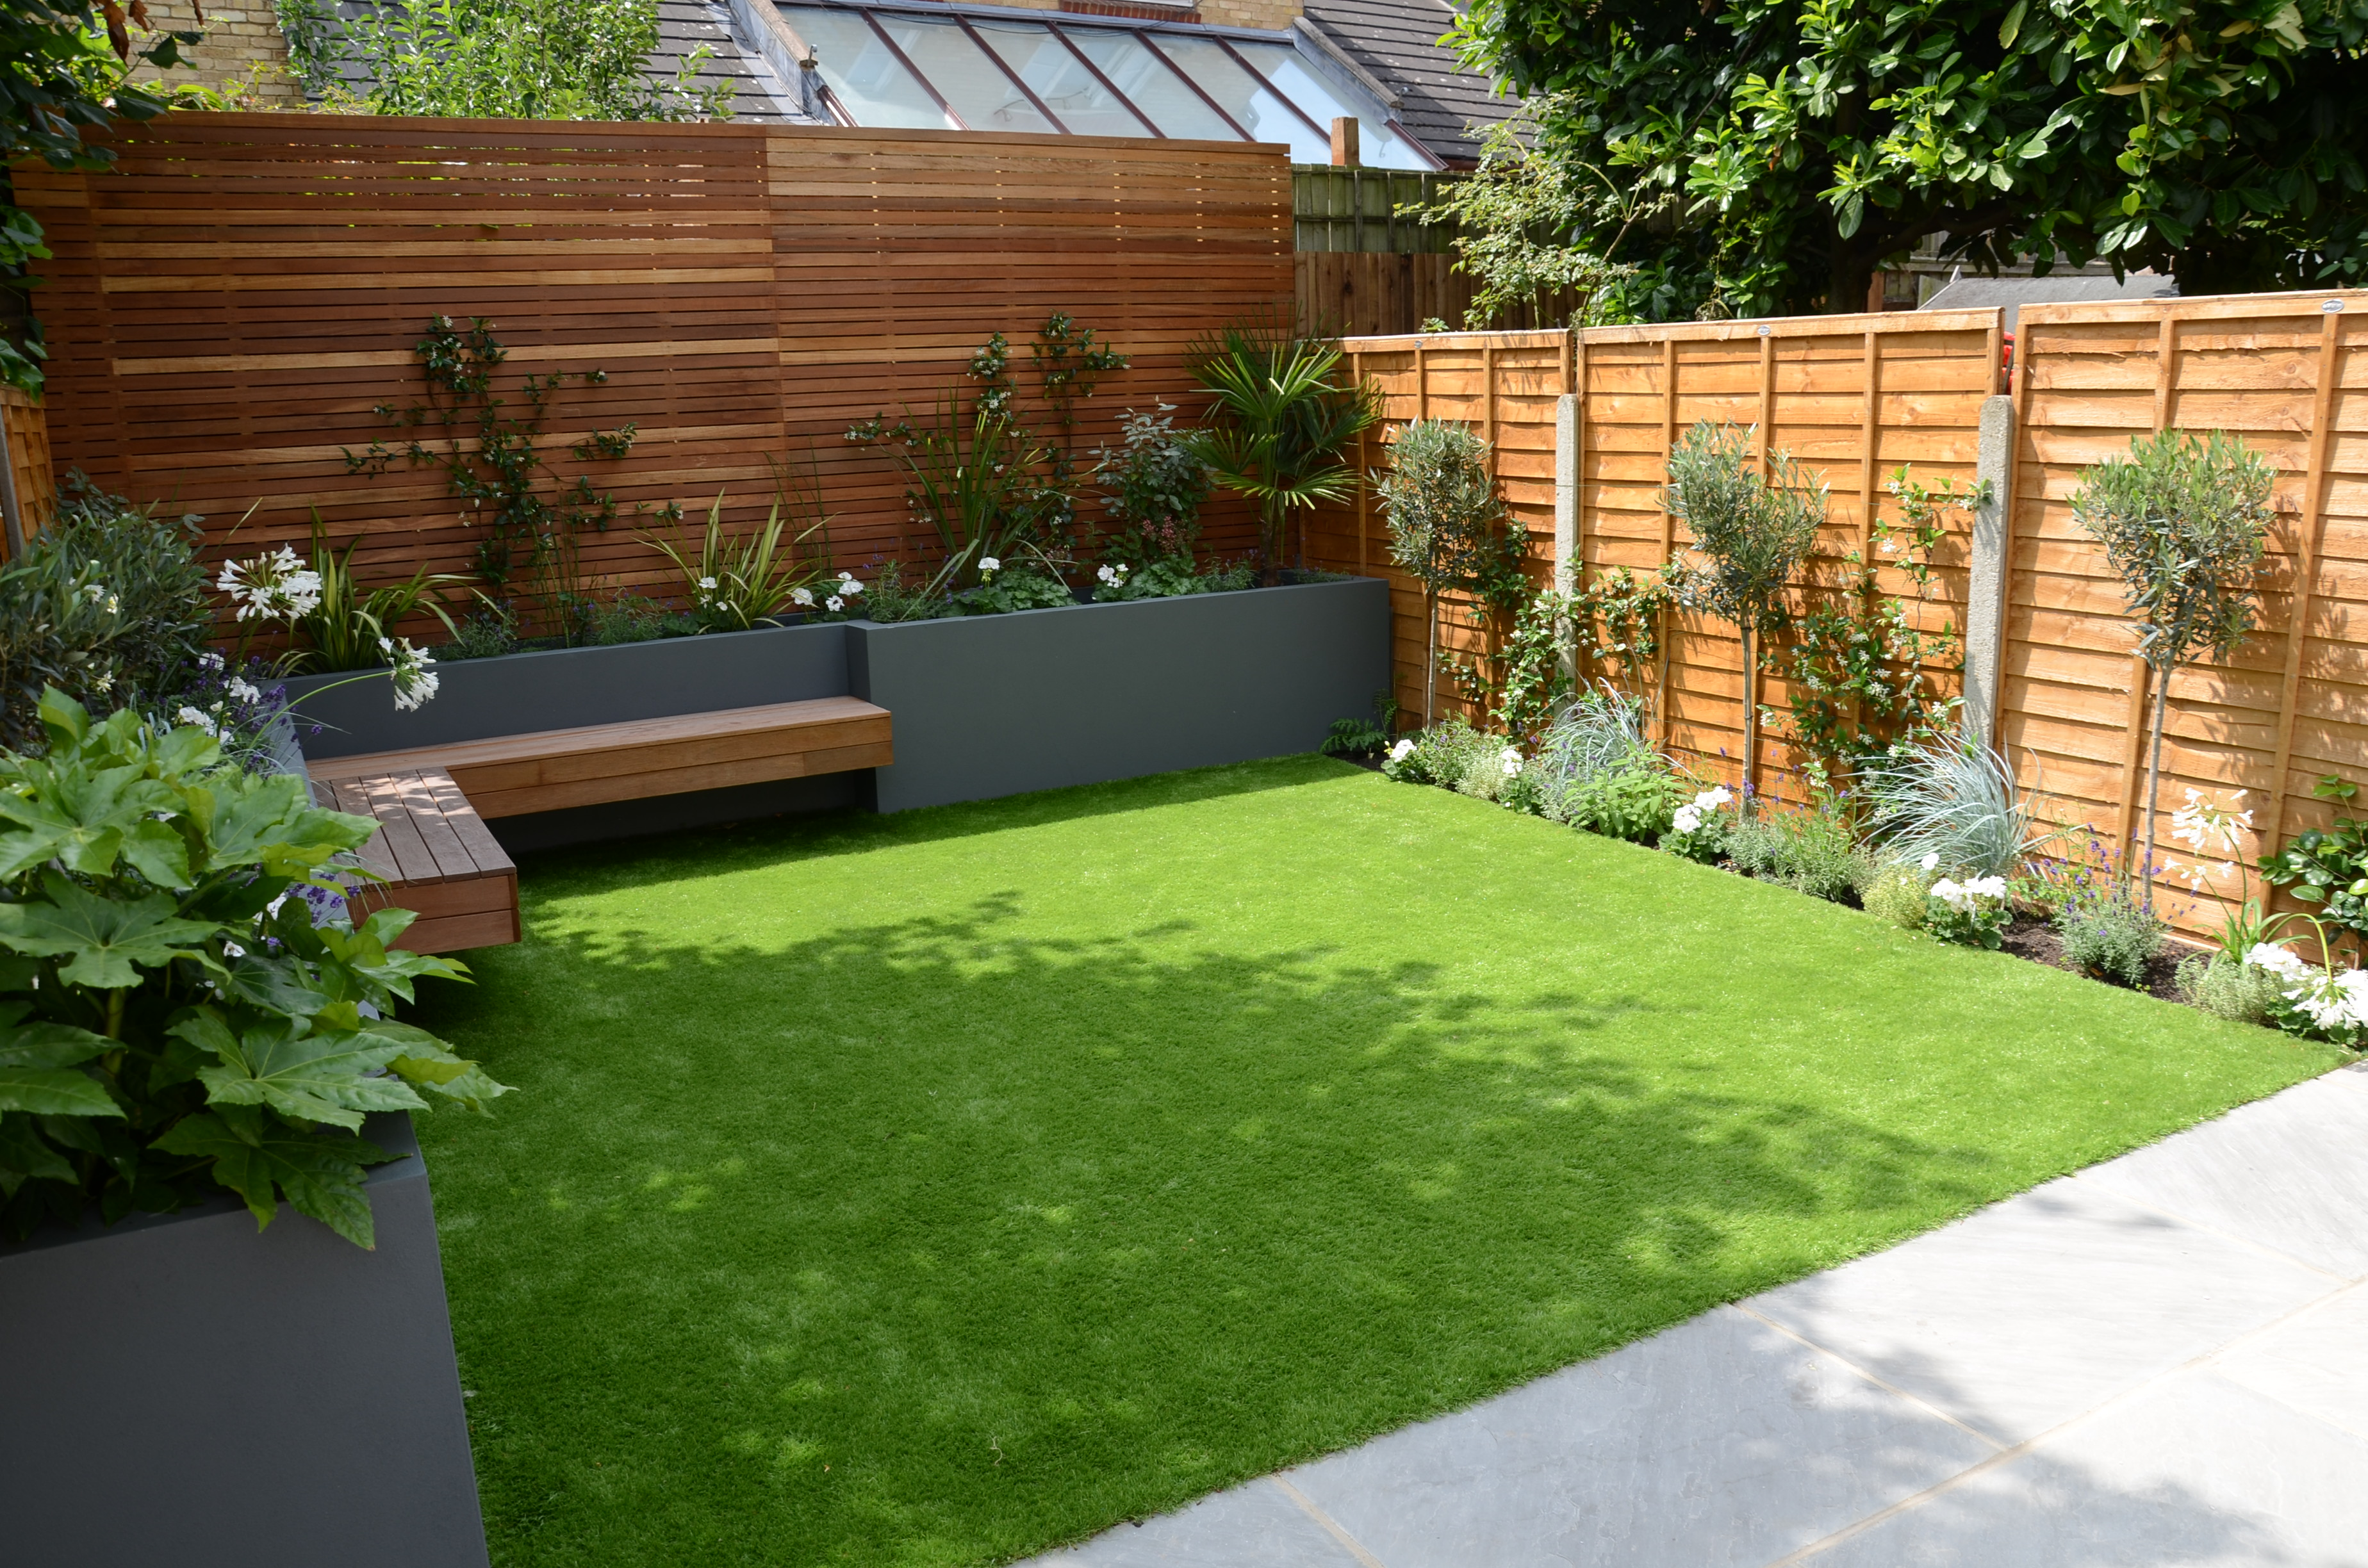 Small Garden Design Fake Grass Low Mainteance Contempoary Design Sleek Fun  VHIFDCY